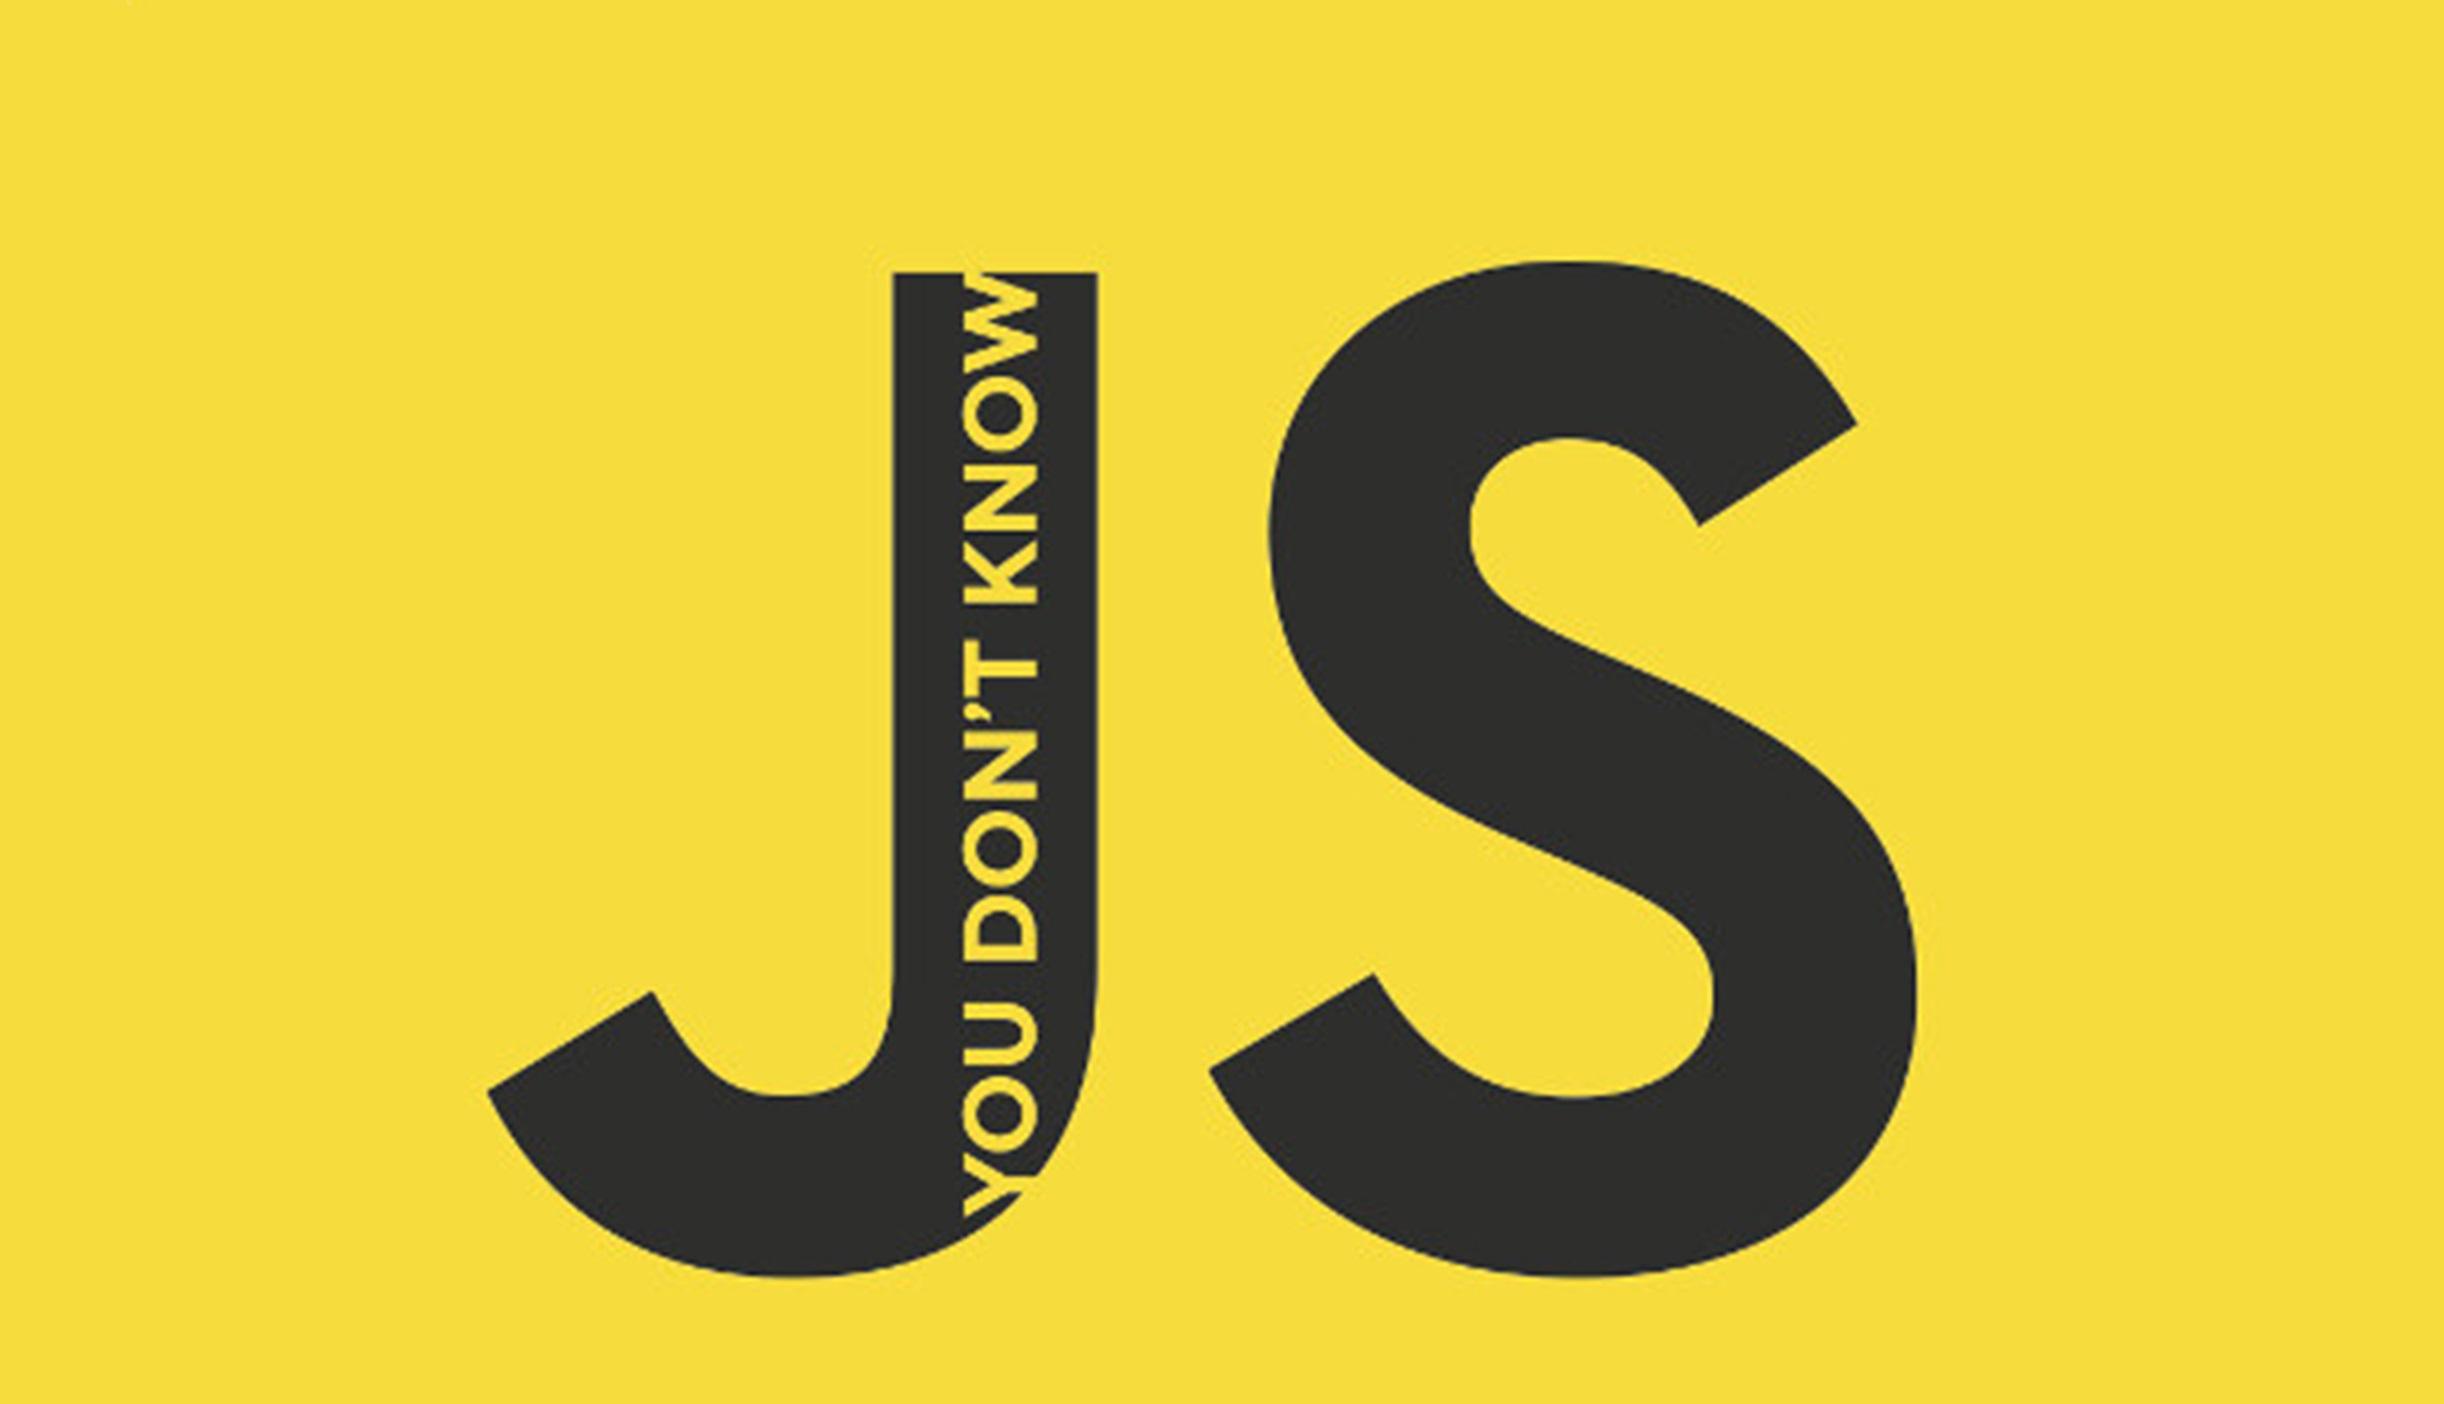 10 recomended javascript books_title2.jpg